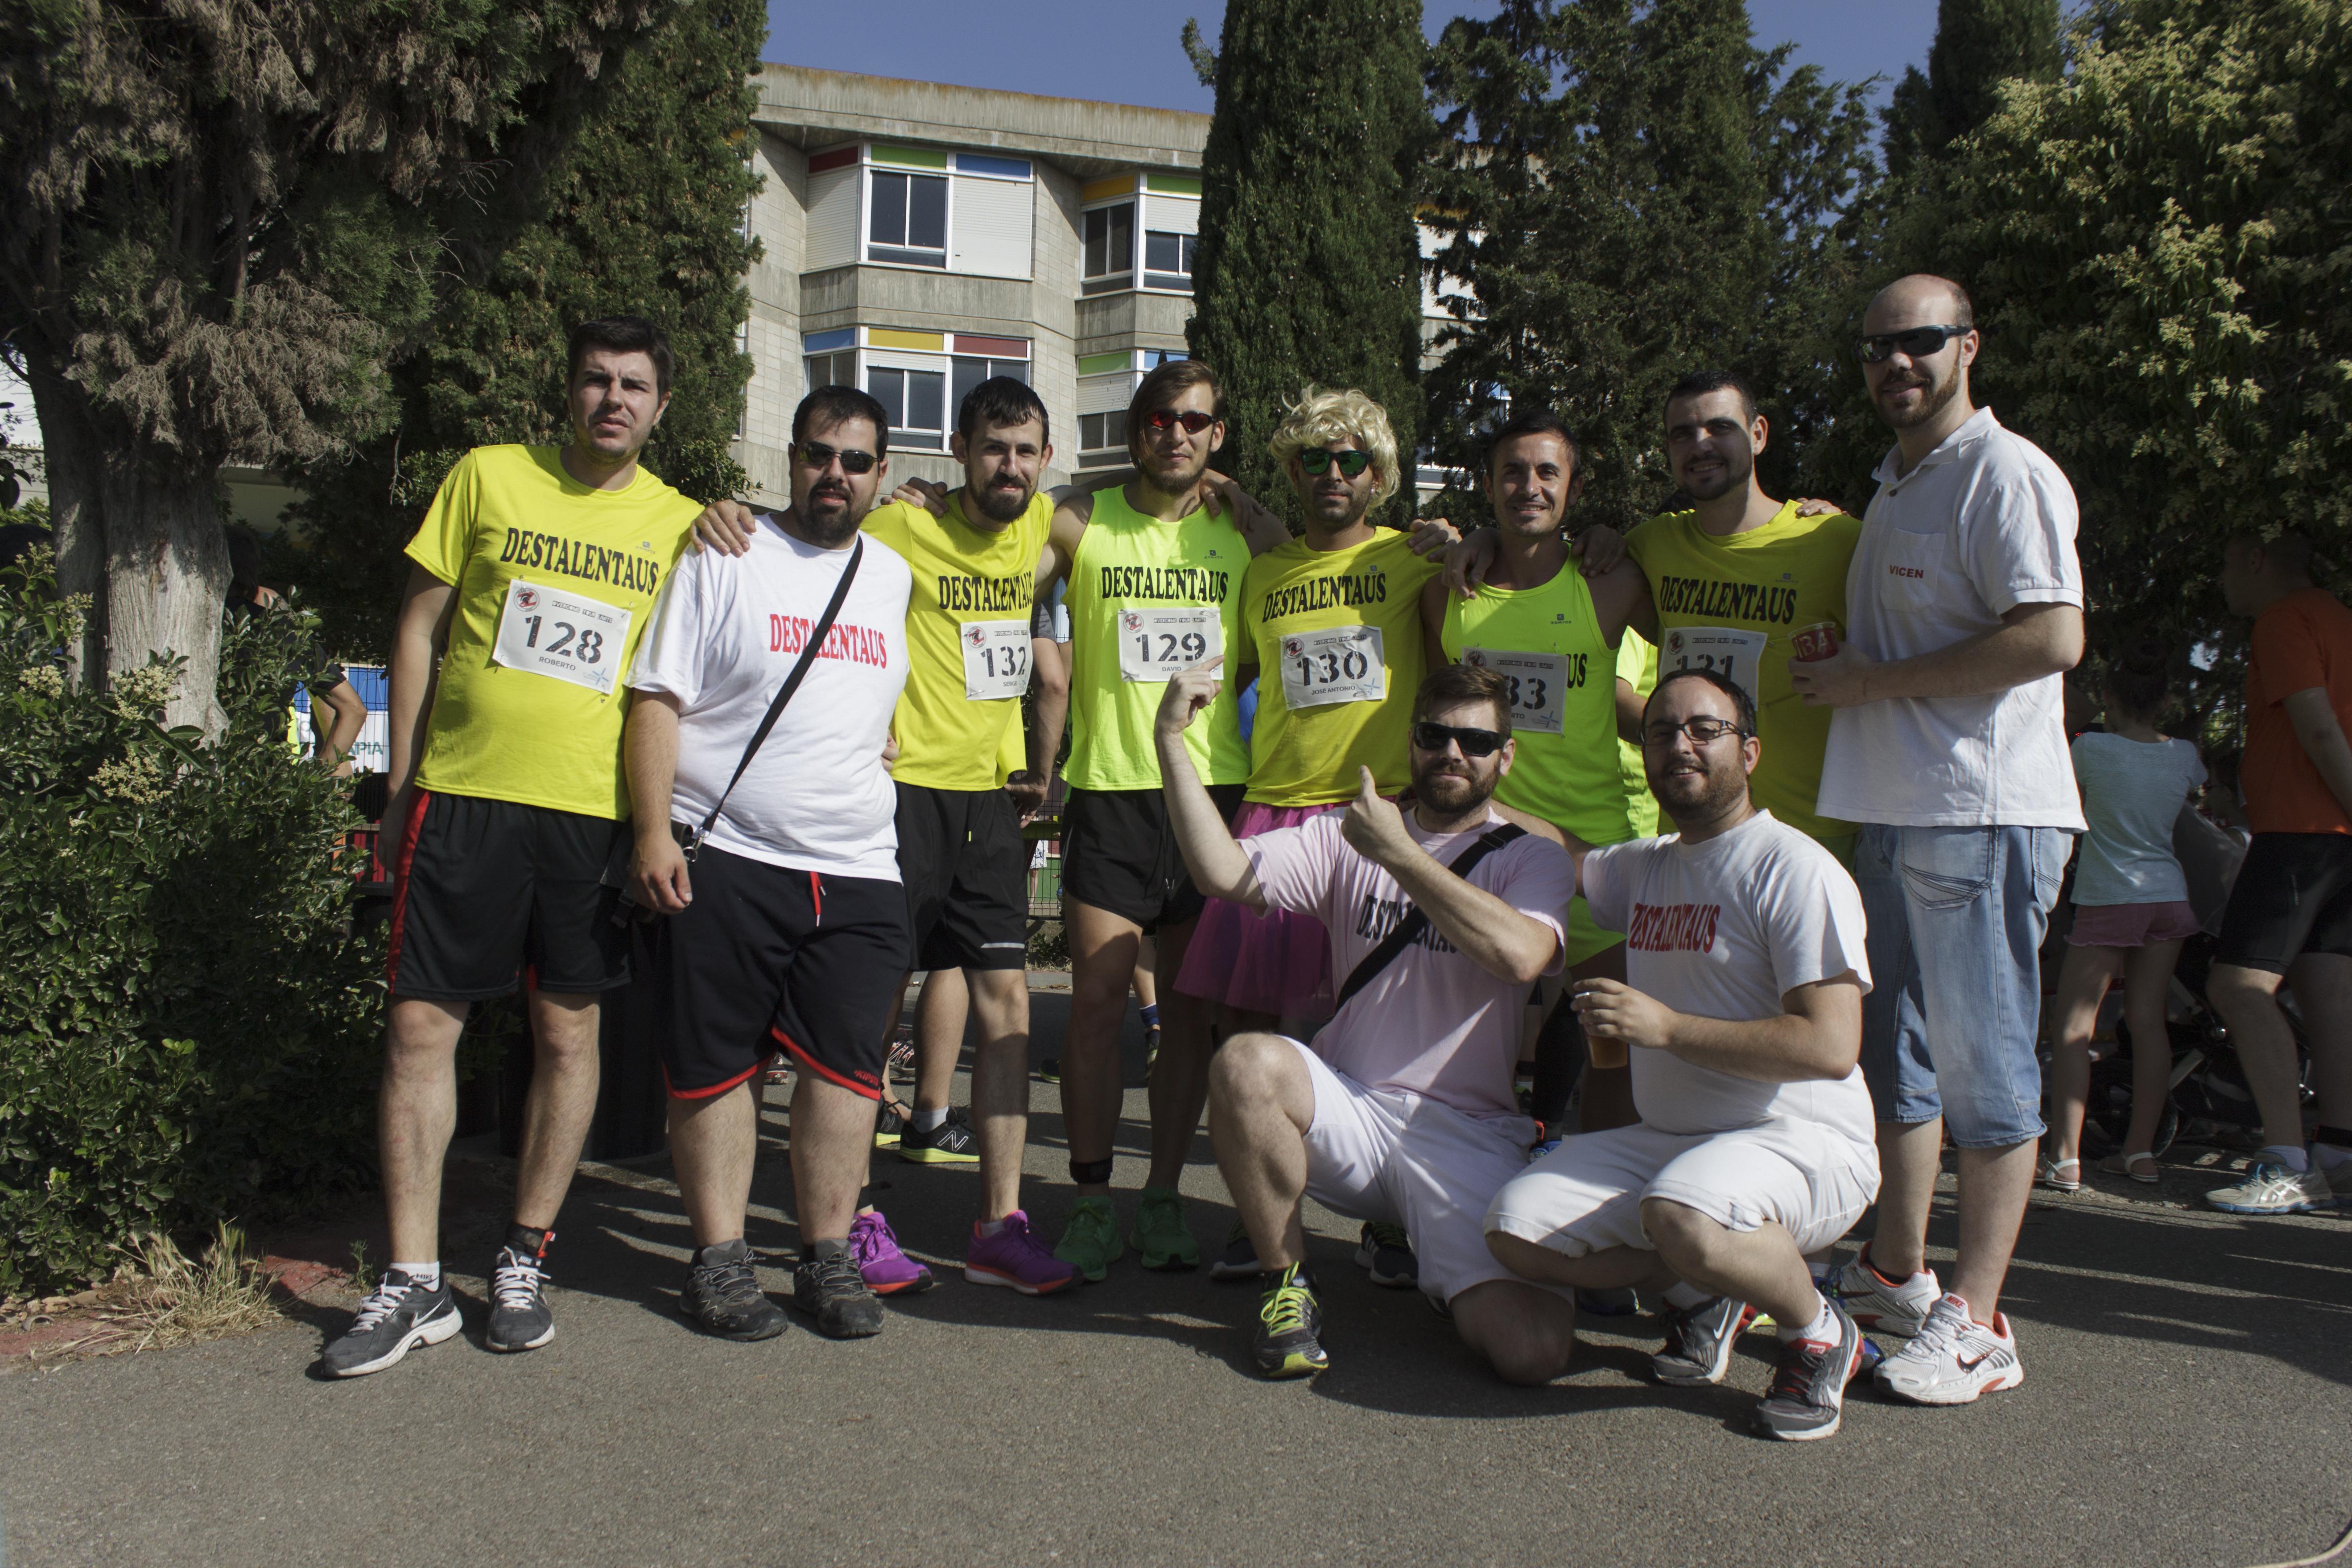 2017_06_24 Zufarian Race II-8630